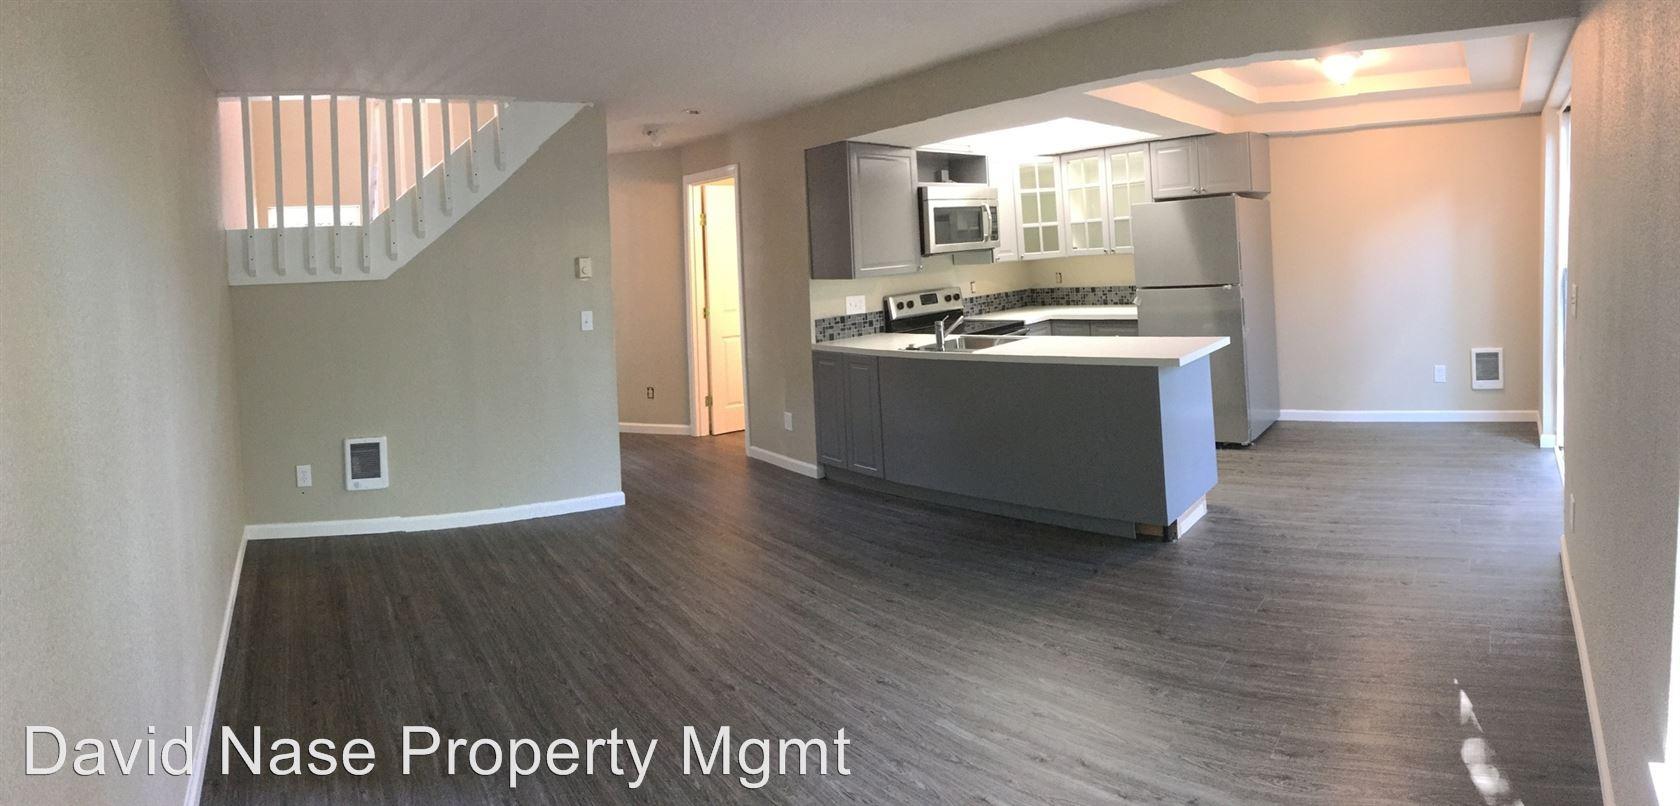 8016 Se Francis St Portland Or 97206 3 Bedroom Apartment For Rent Padmapper